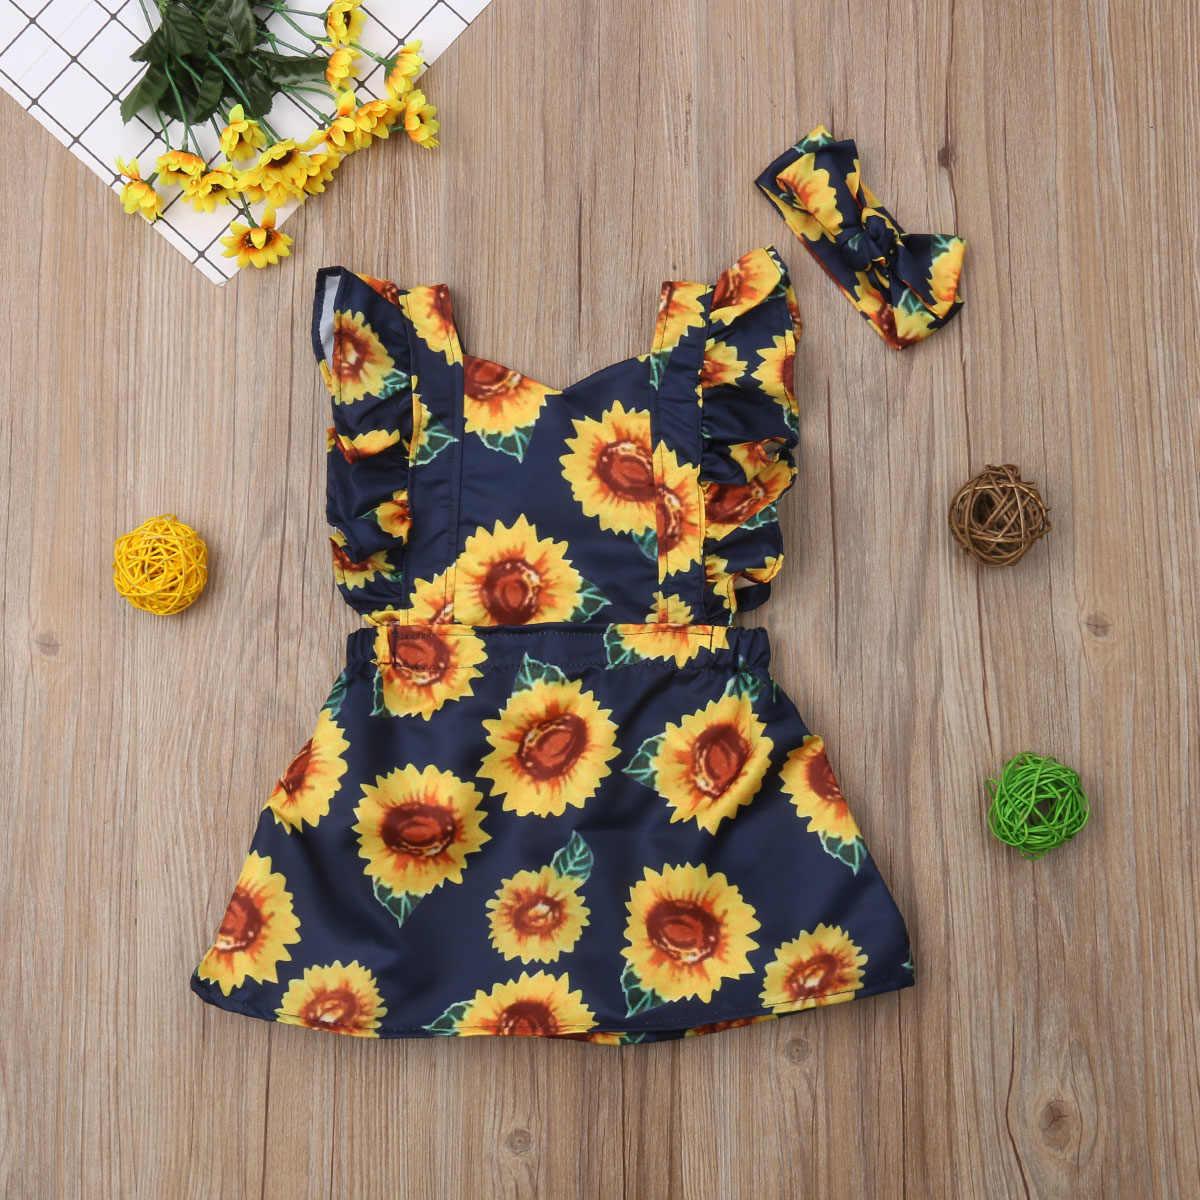 b376edf60 ... Lovely Infant Toddler Kid Baby Girl Ruffles Sleeveless Backless  Sunflower Red Plaid A-line Princess ...